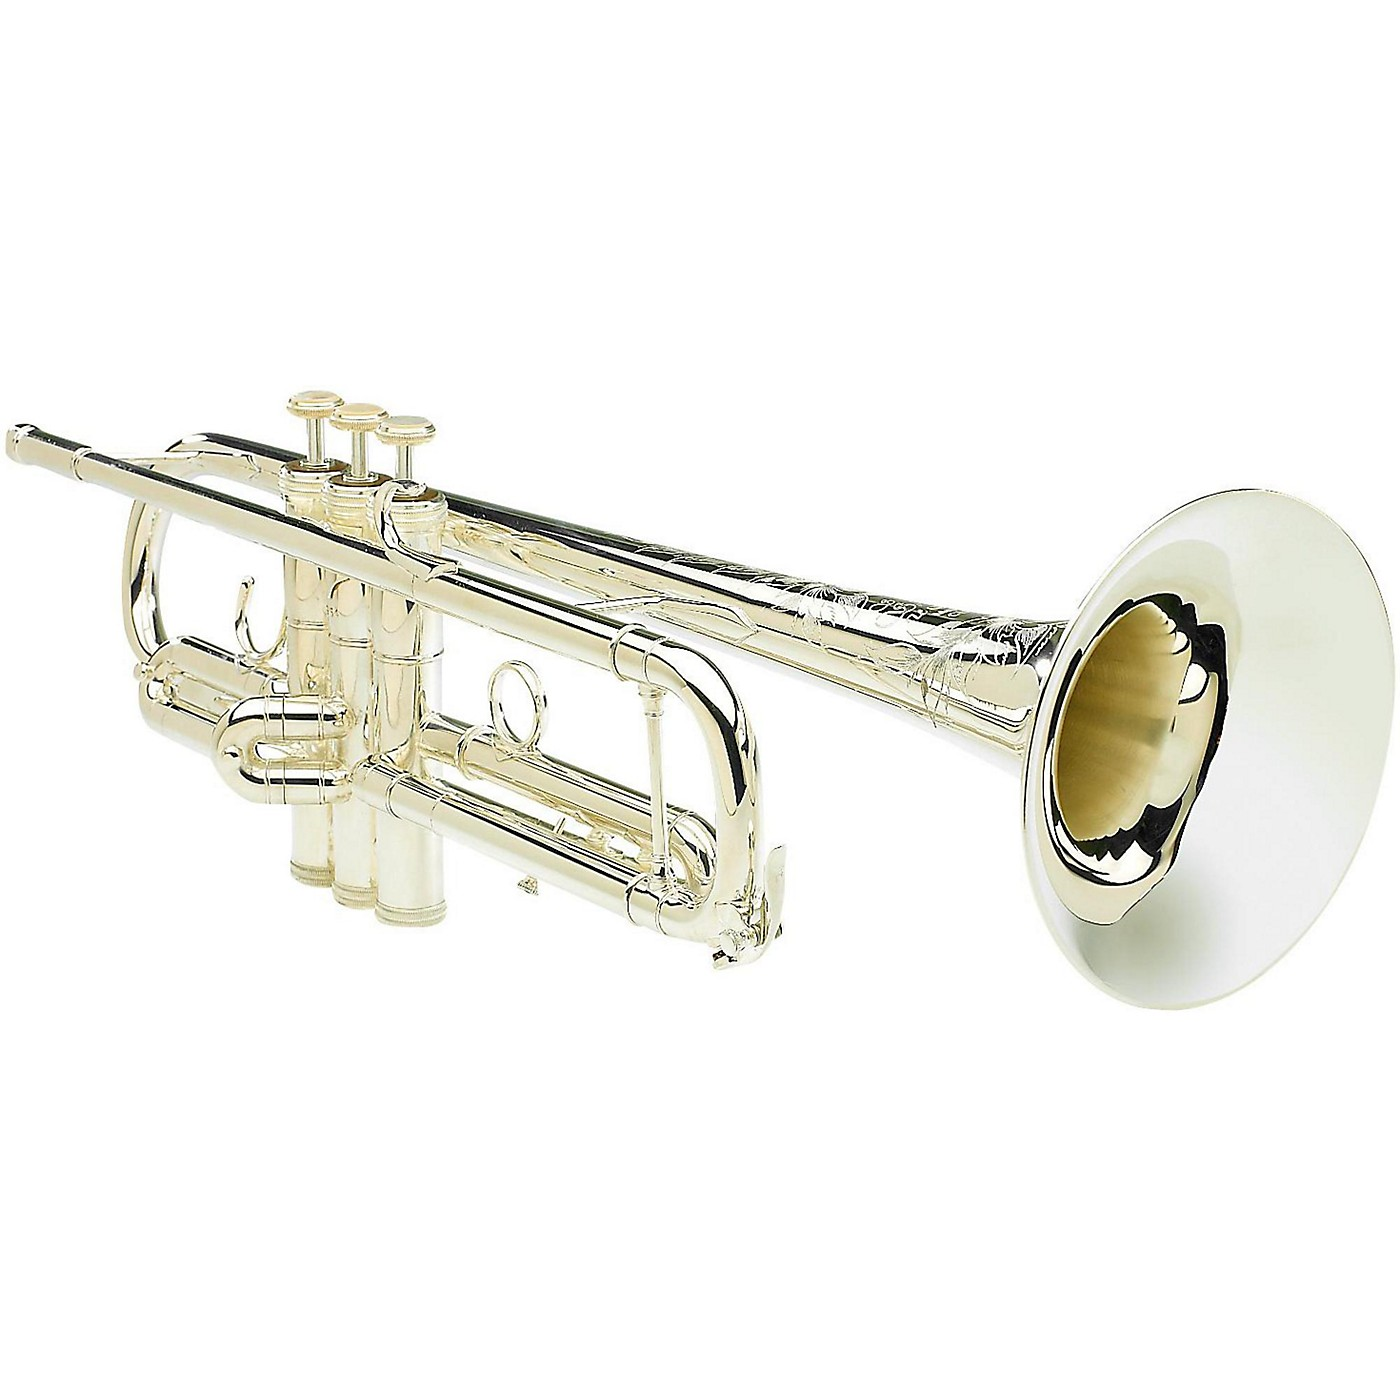 S.E. SHIRES Model CVP Series Bb Trumpet thumbnail